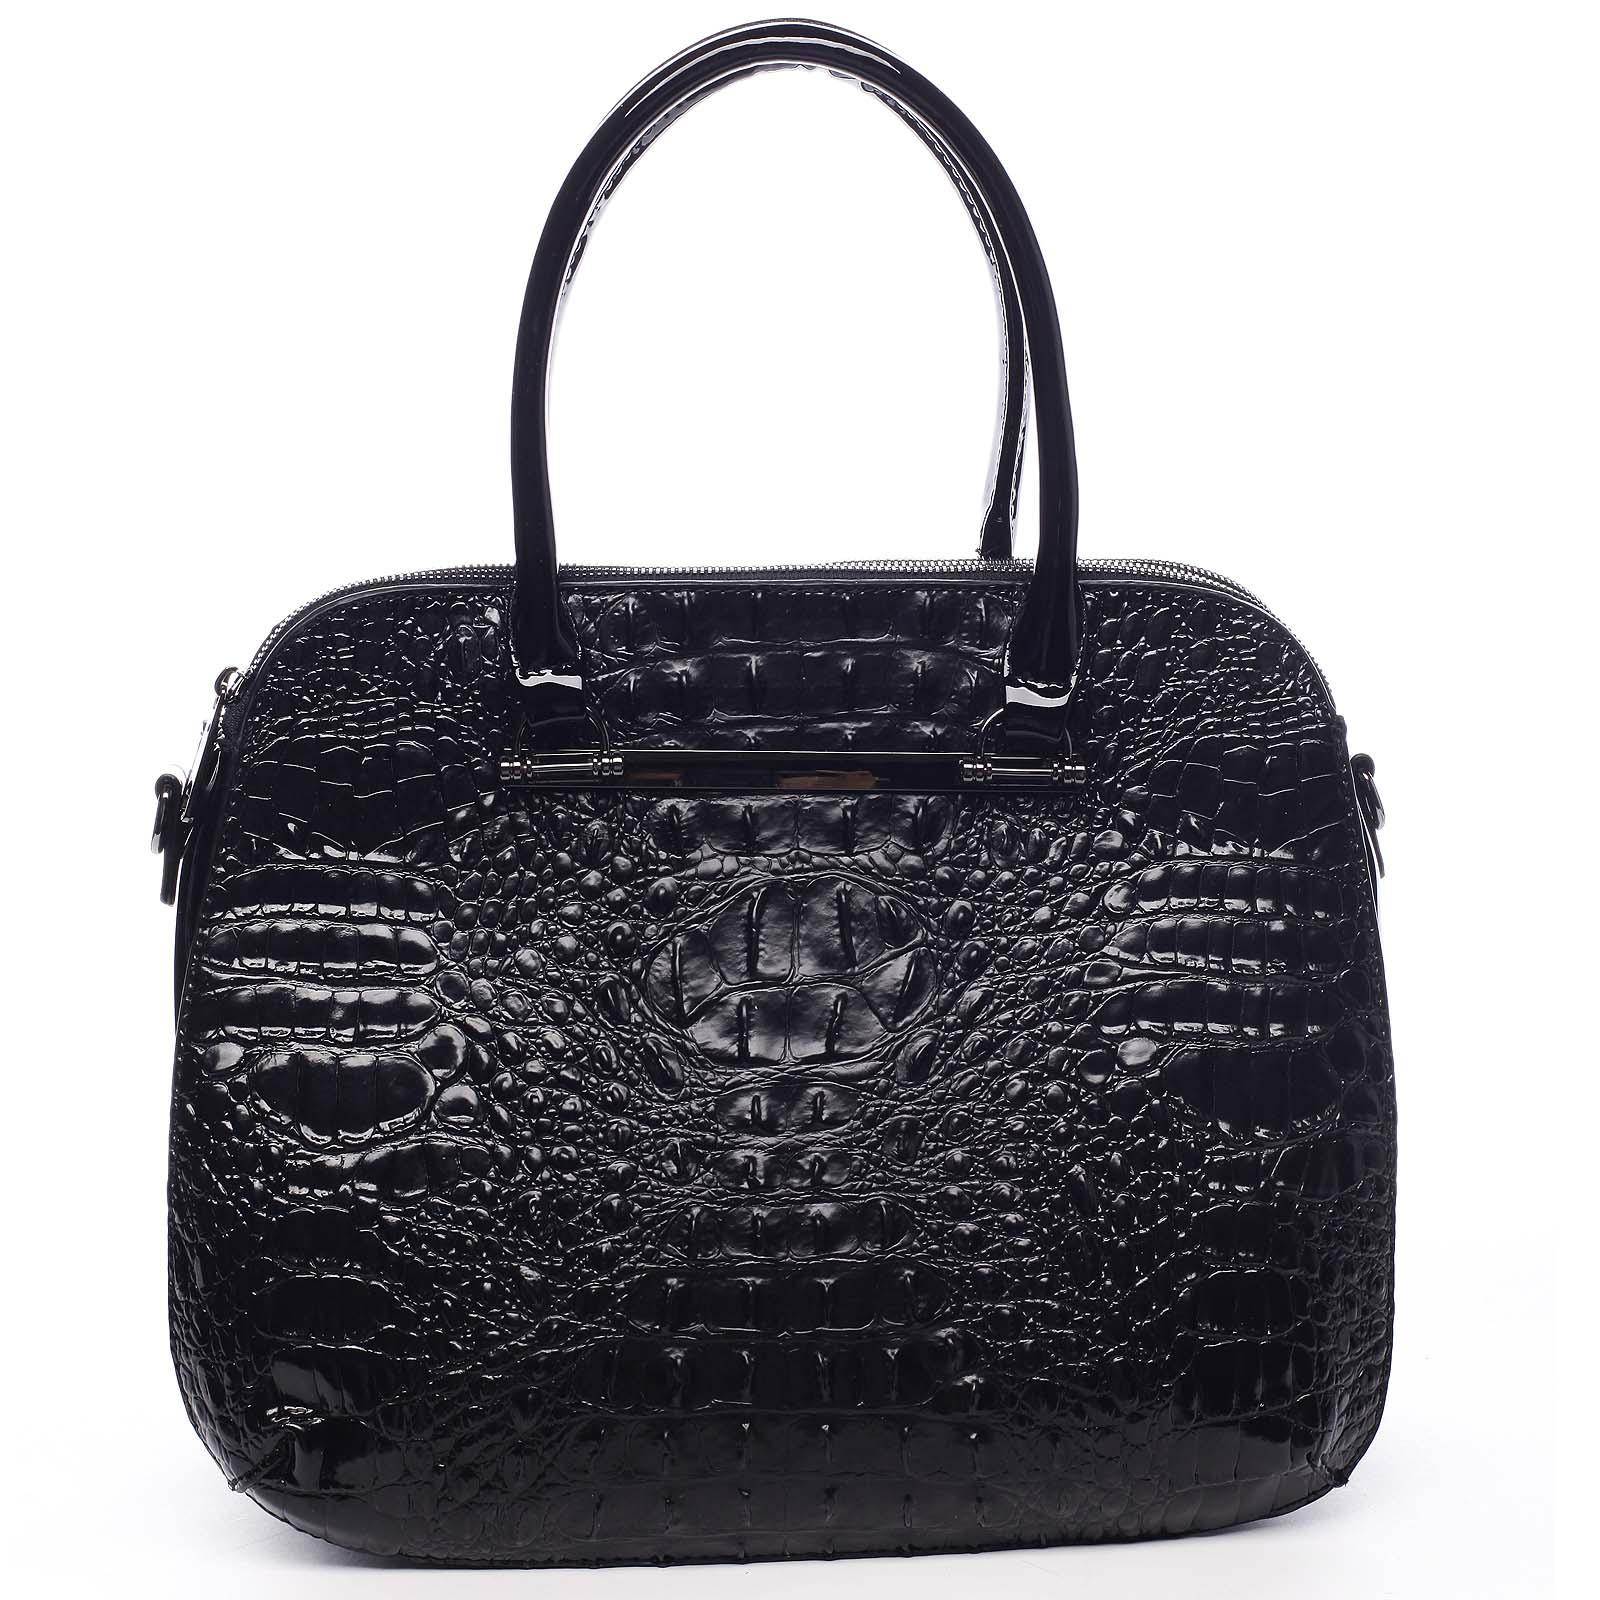 Dámska kabelka do ruky čierna - Dudlin Lexi čierna